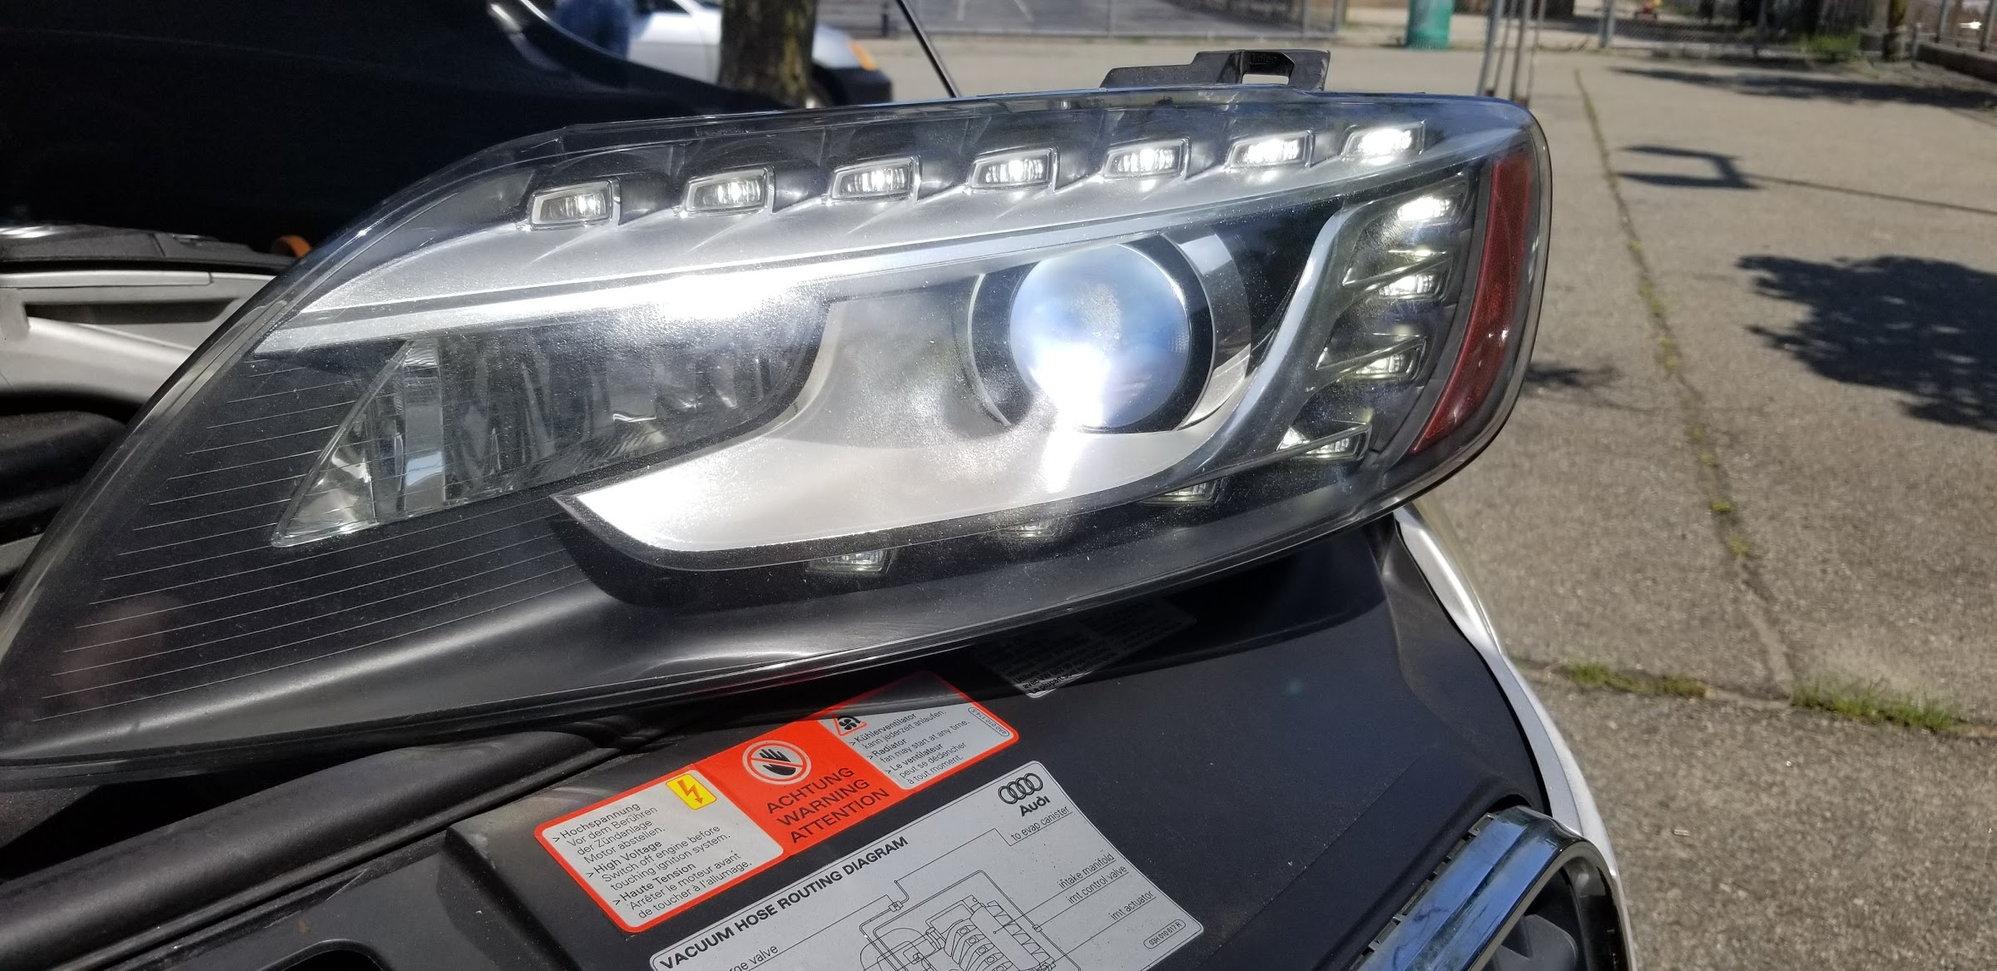 2009 Audi Q7 LED Headlight Retrofit - AudiWorld Forums   Audi Q7 Headlight Wiring Diagram      AudiWorld